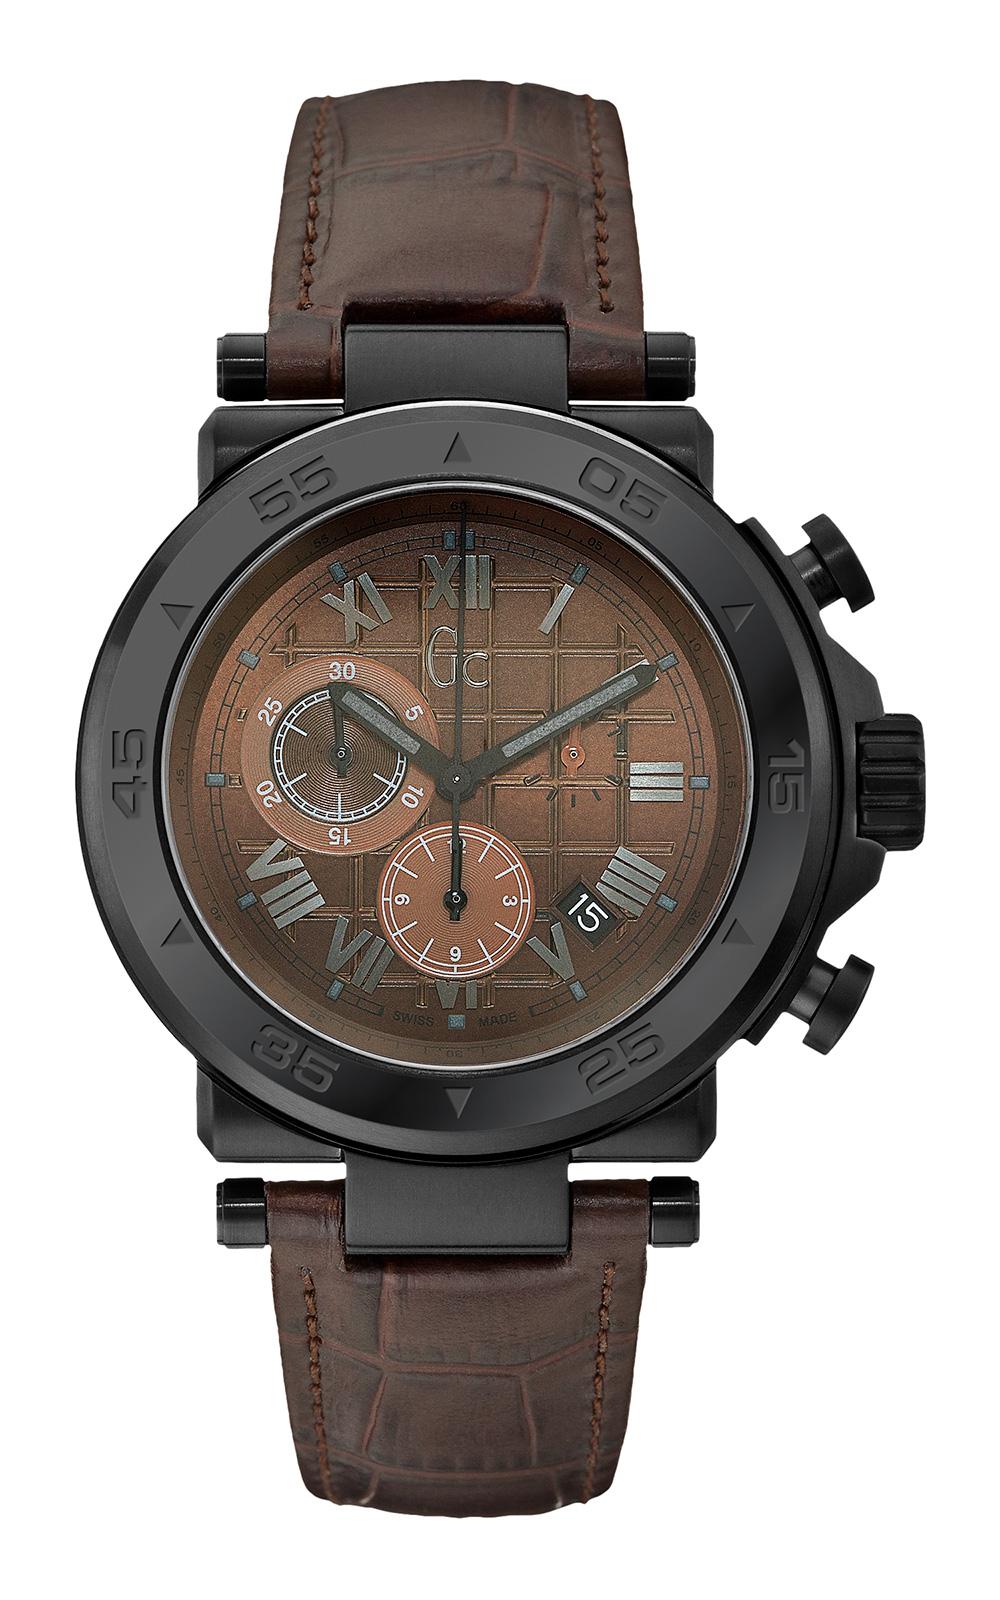 GC X90003G4S Ανδρικό Ρολόι Quartz Χρονογράφος Ακριβείας